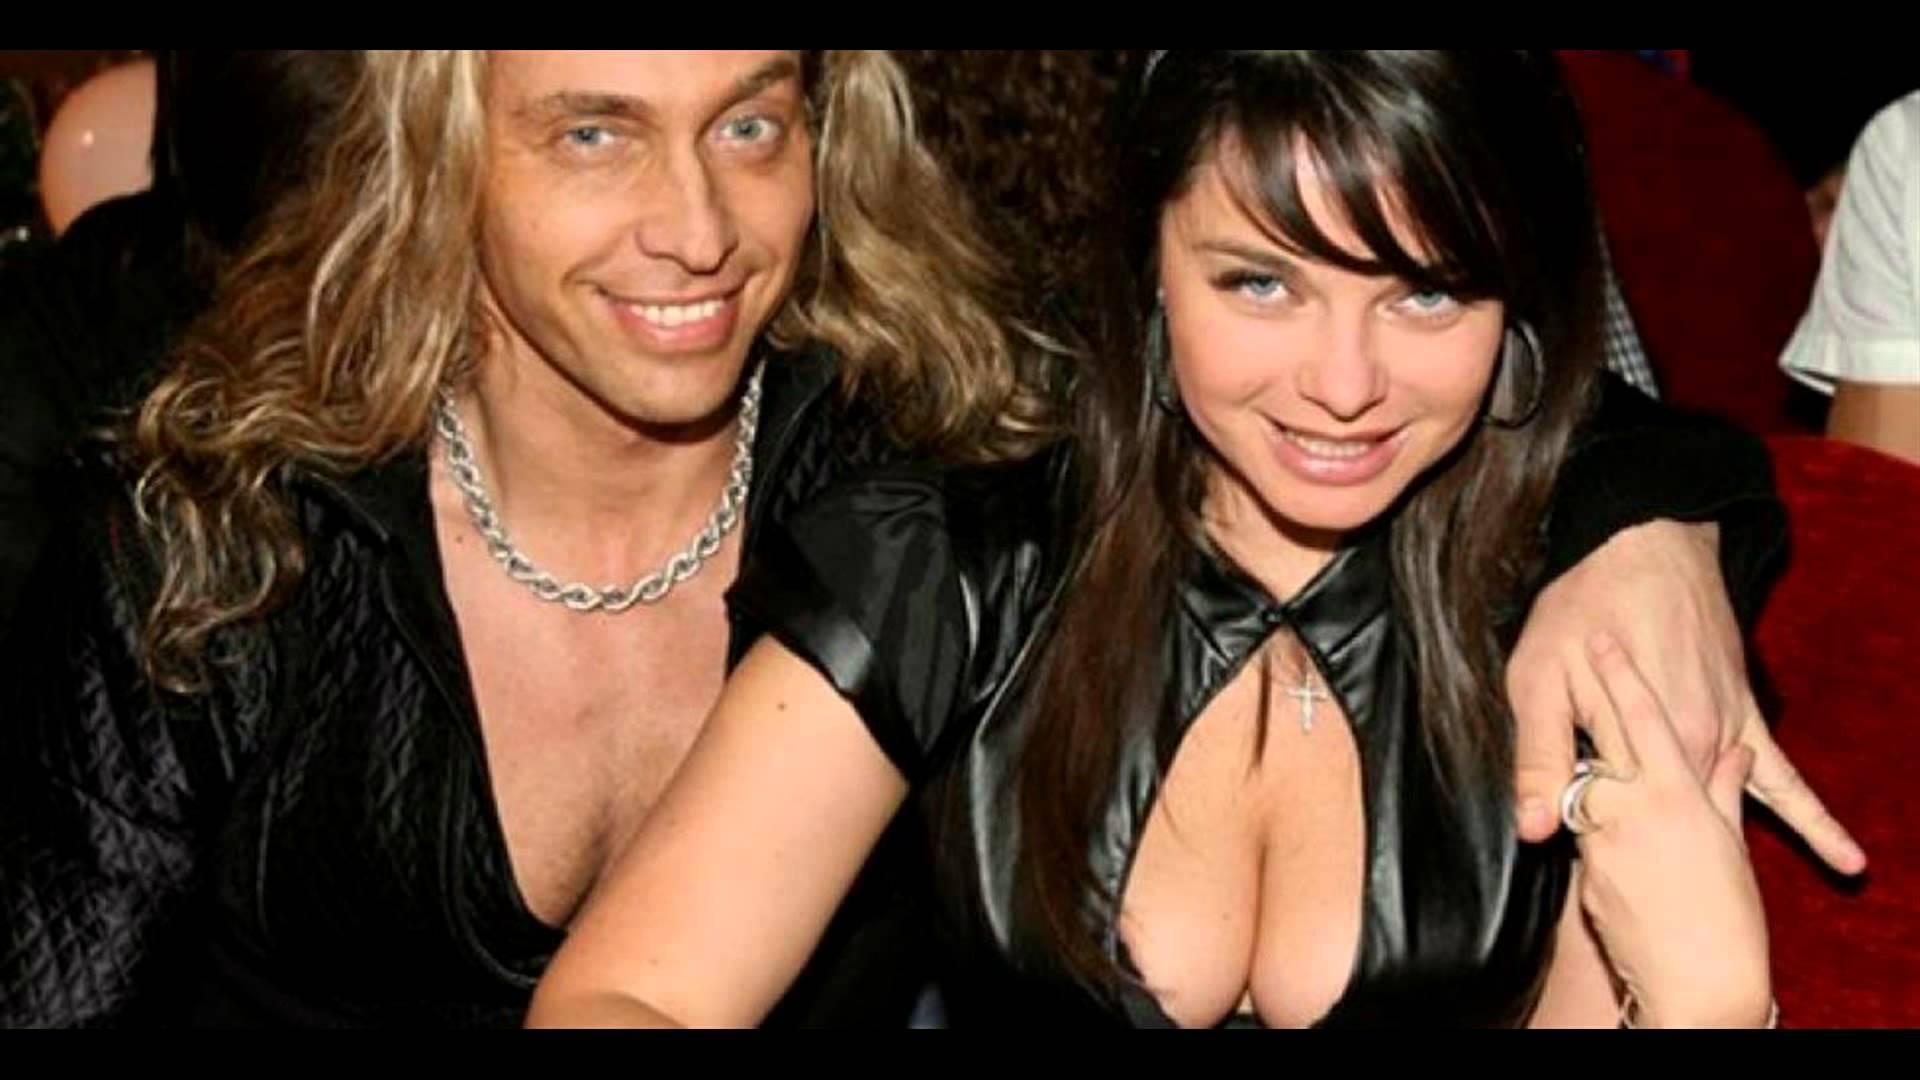 The network has BOILER PHOTOS of Tarzan And Natasha Koroleva